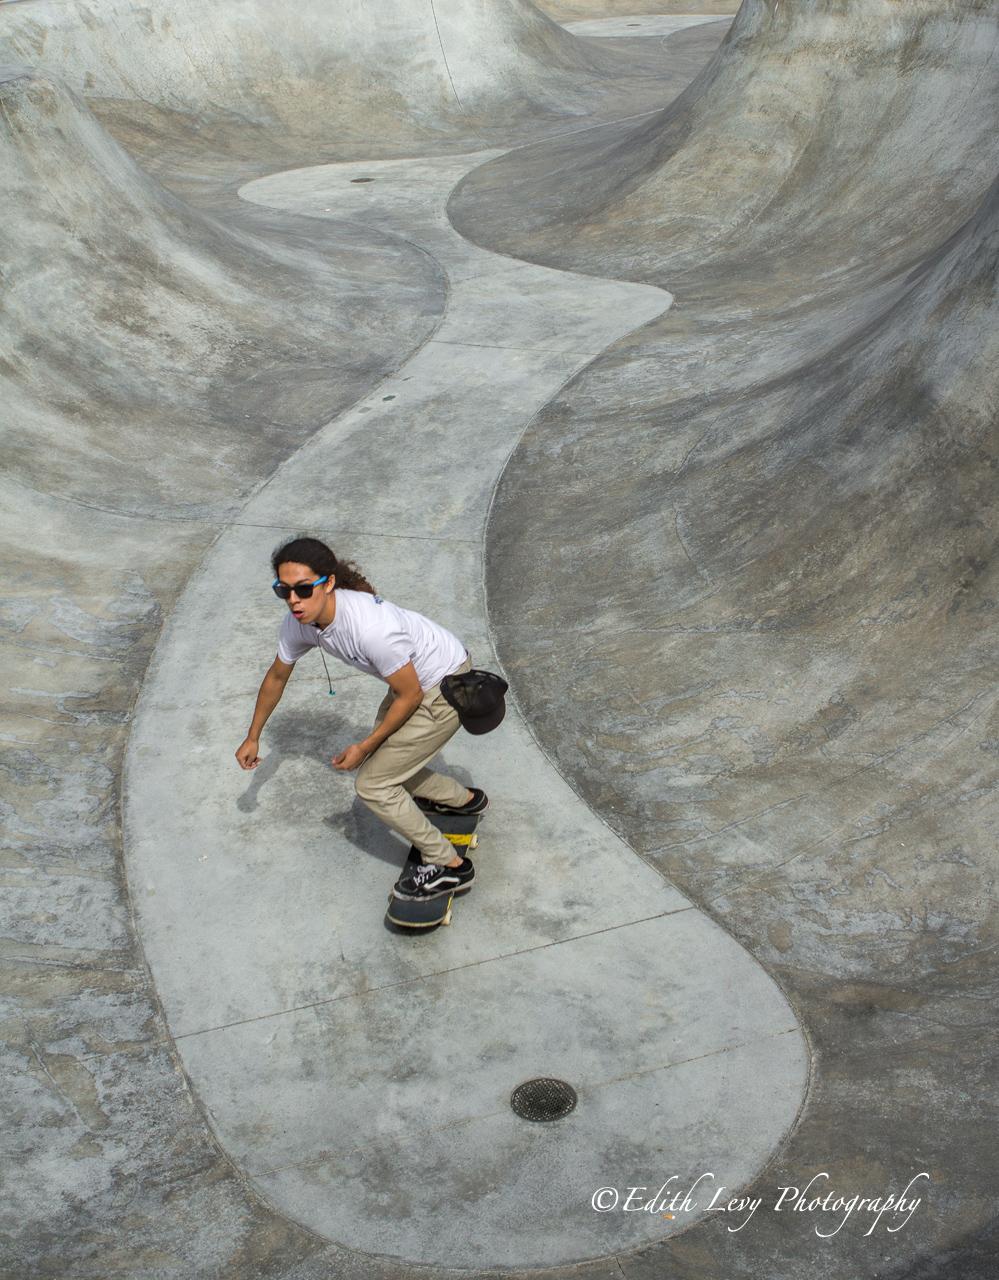 Venice Beach, California, skateboard, skateboarder, skate park